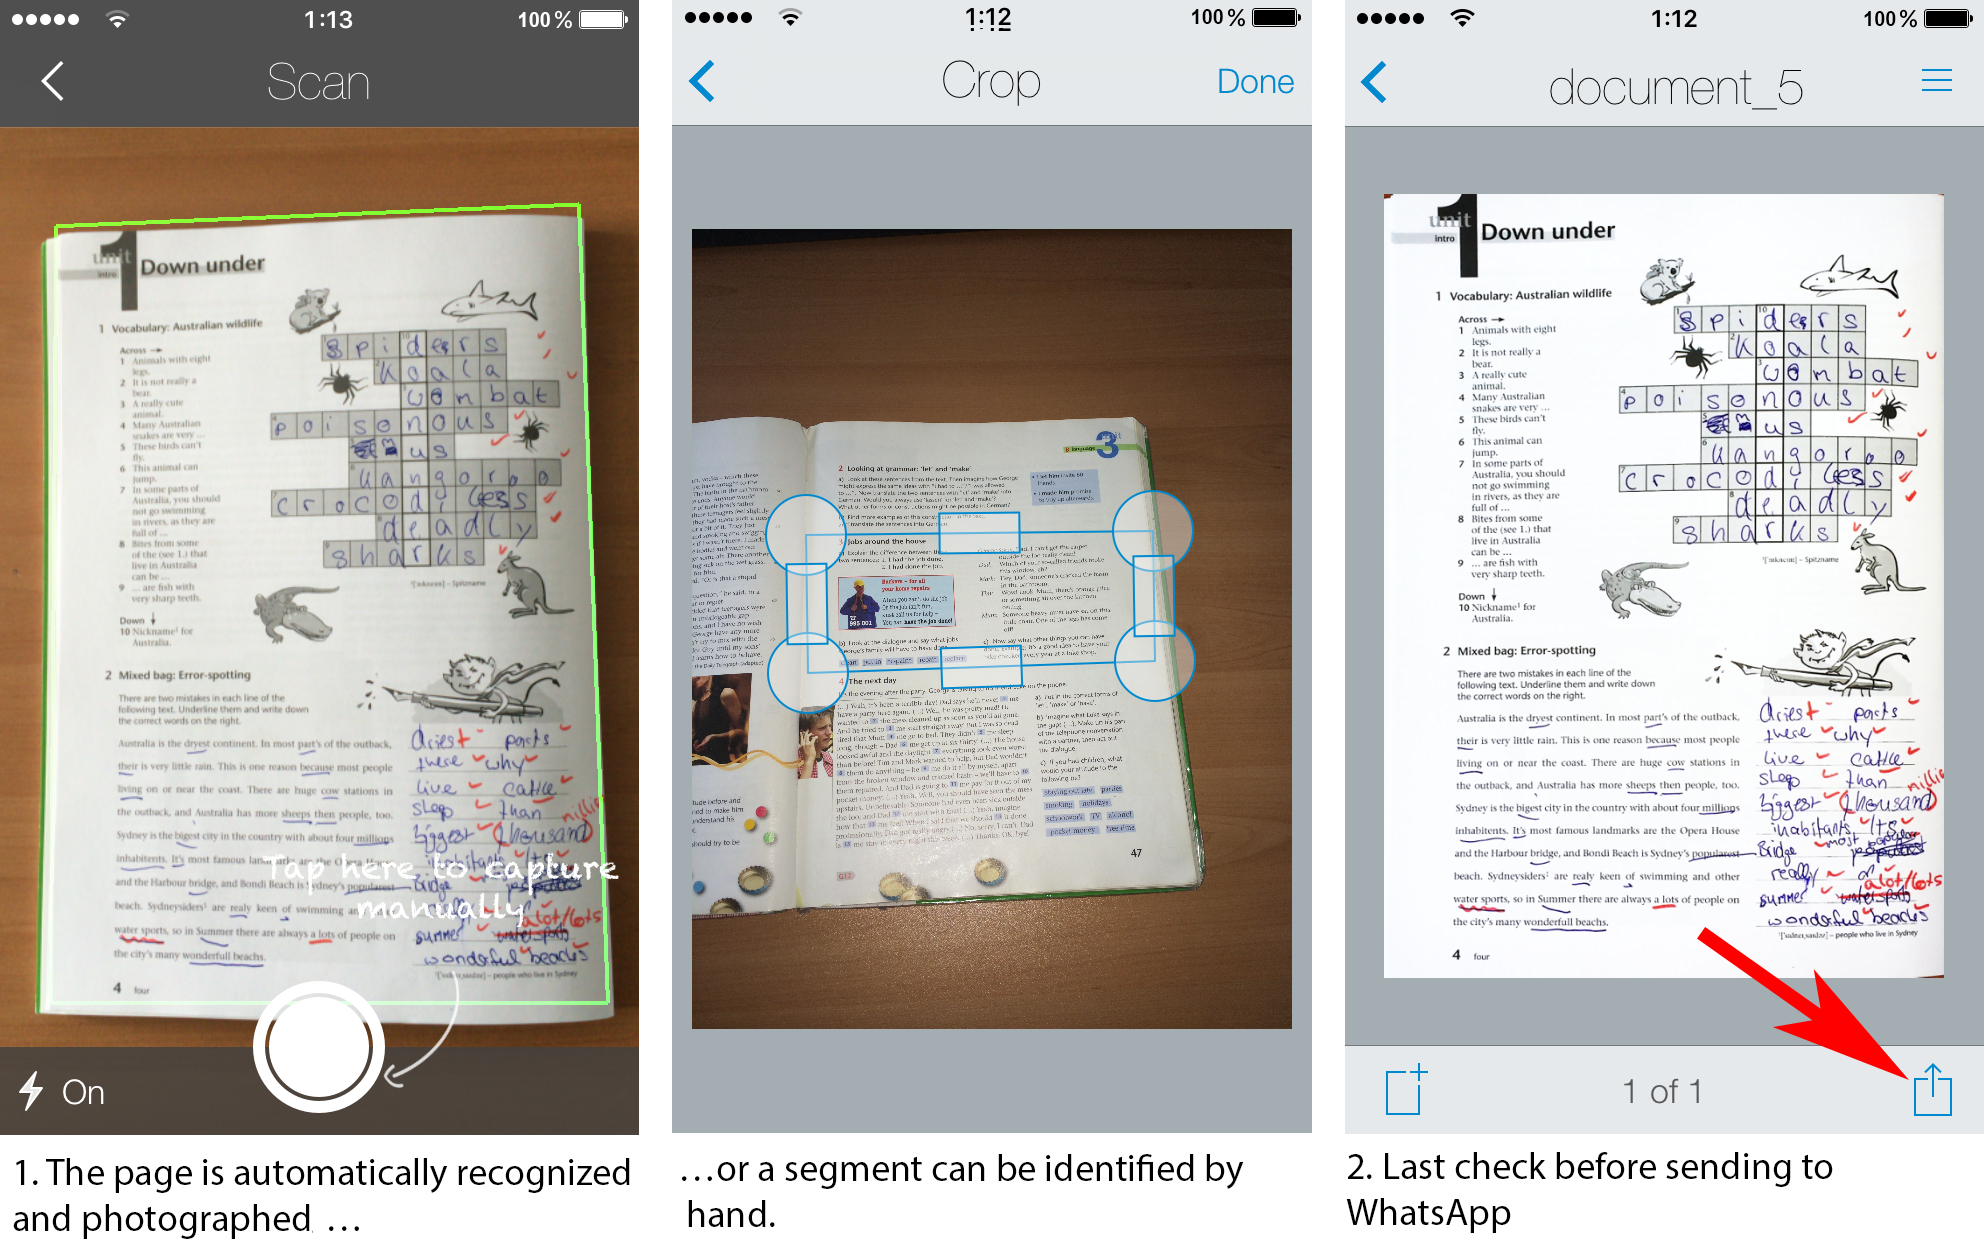 Paperscan_Screenshot1new.png